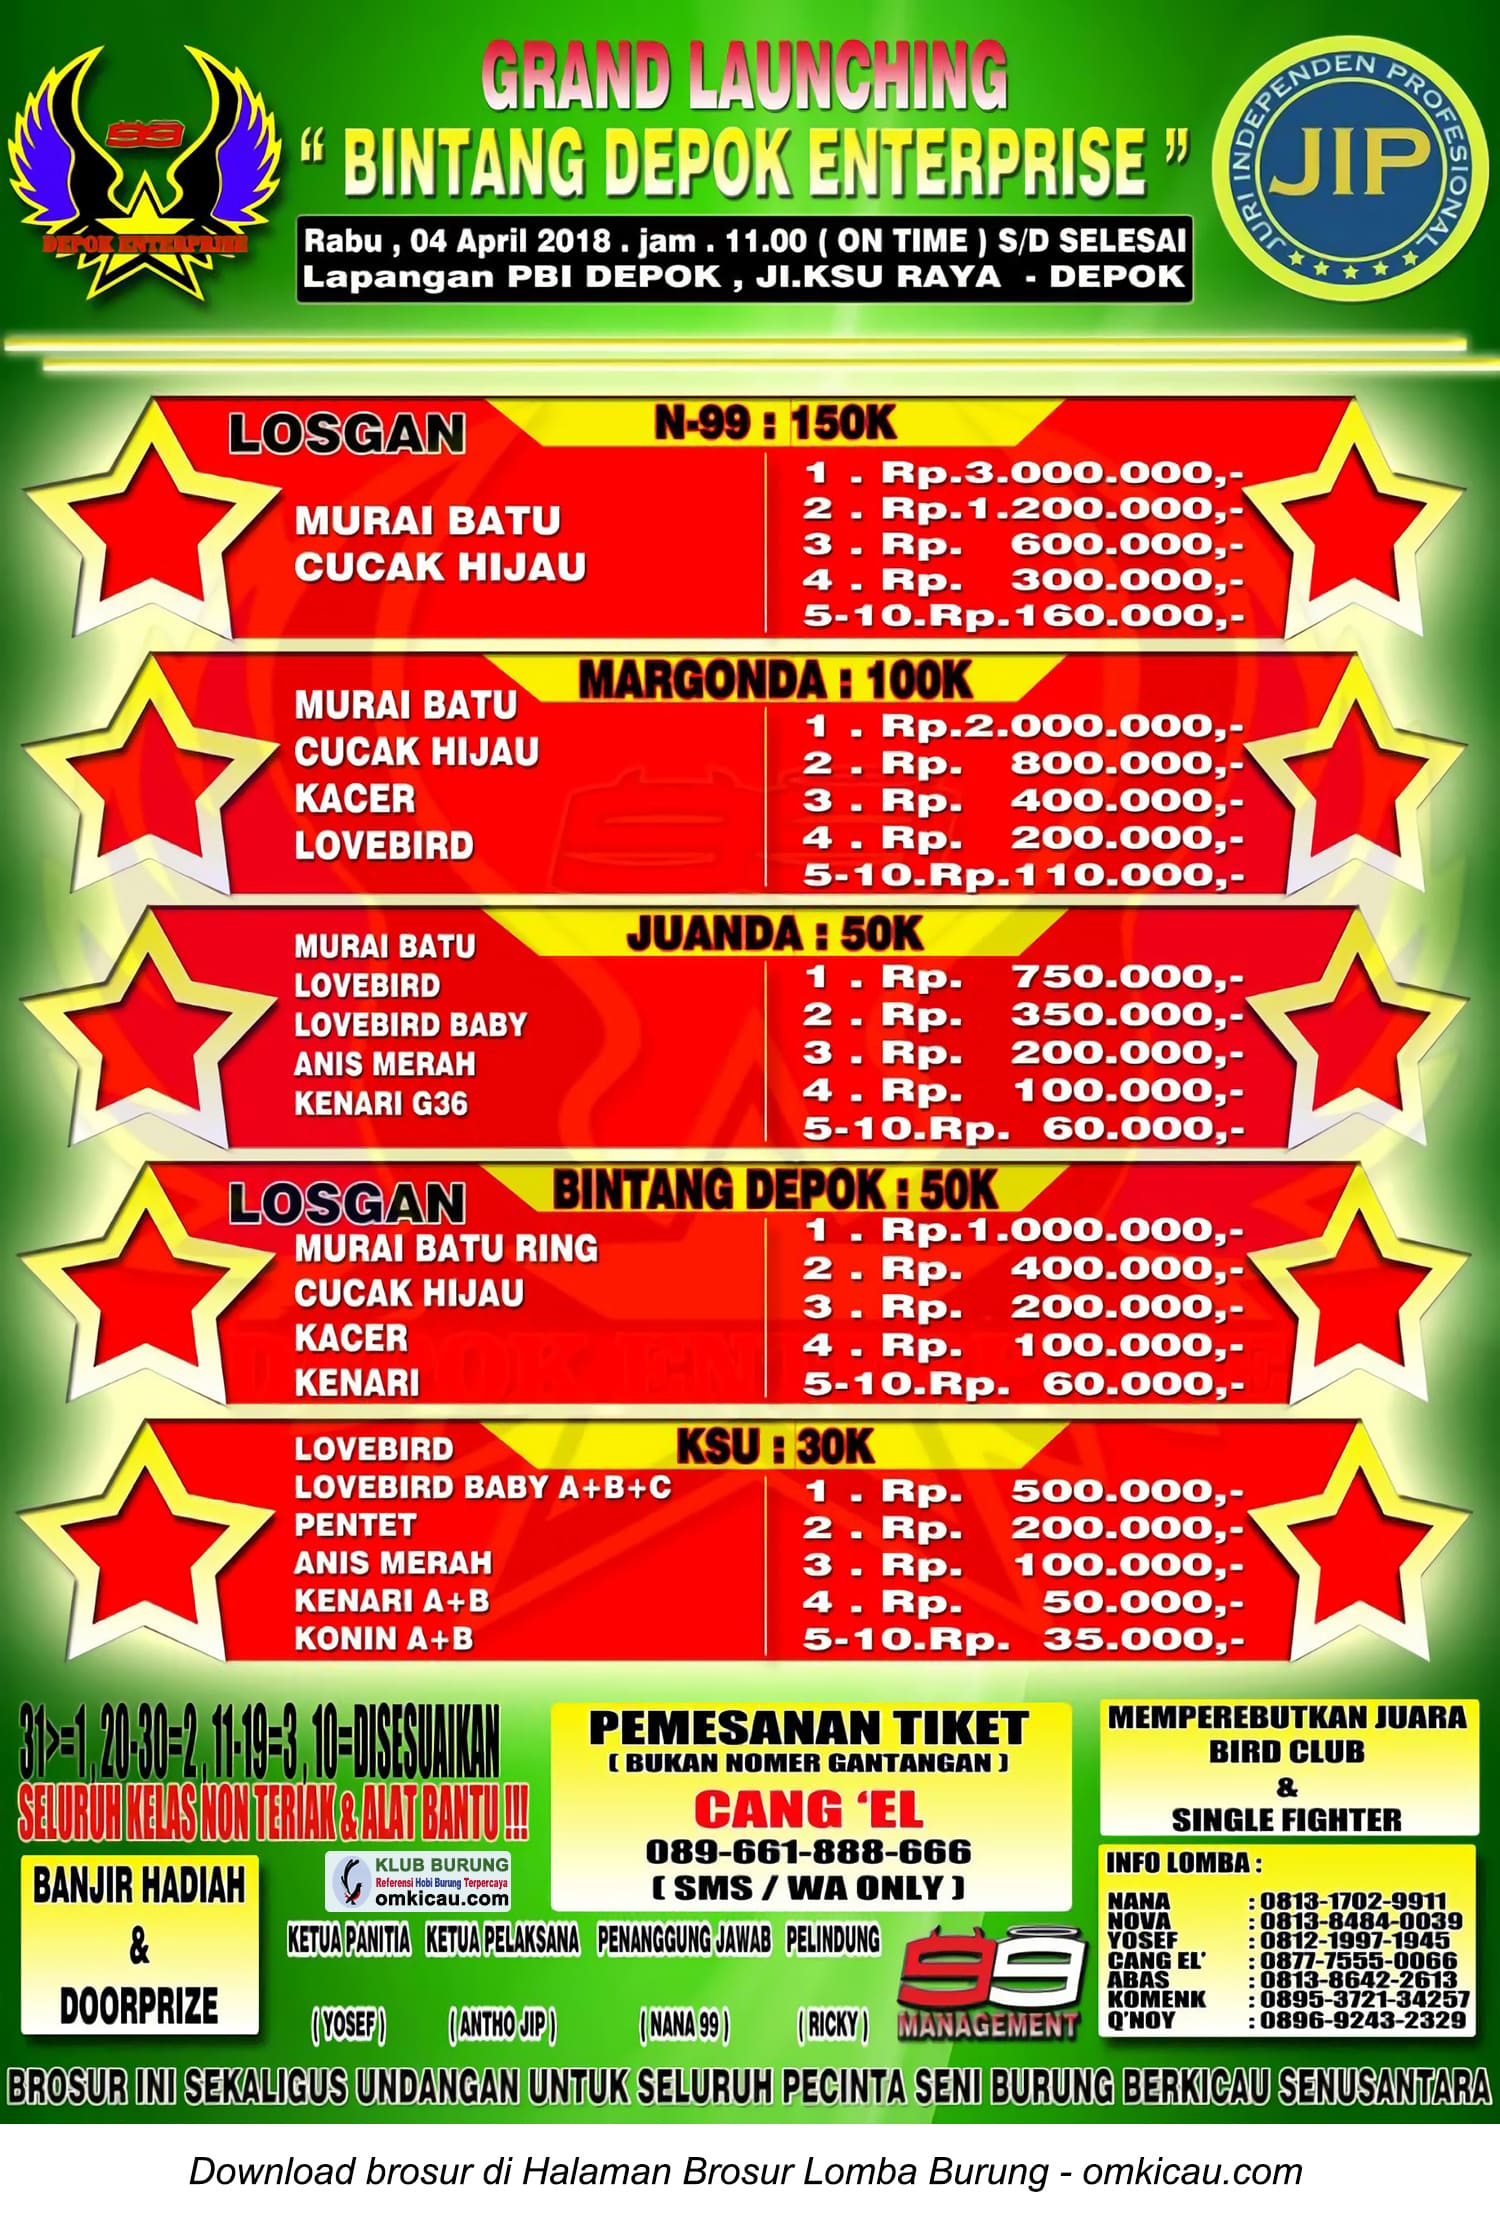 Grand Launching Bintang Depok Enterprise